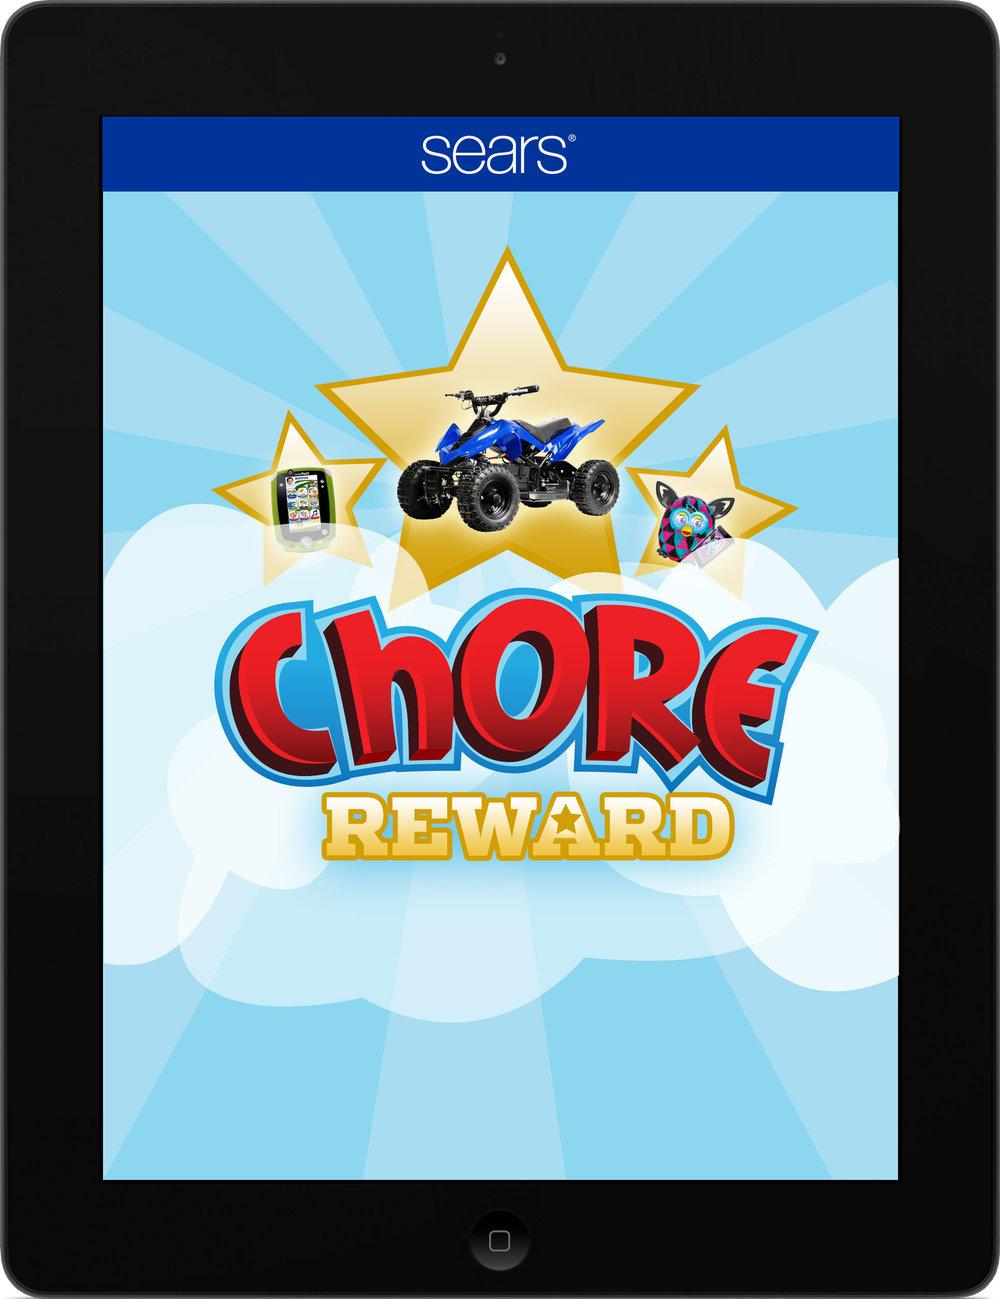 chore_reward_app_1.jpg